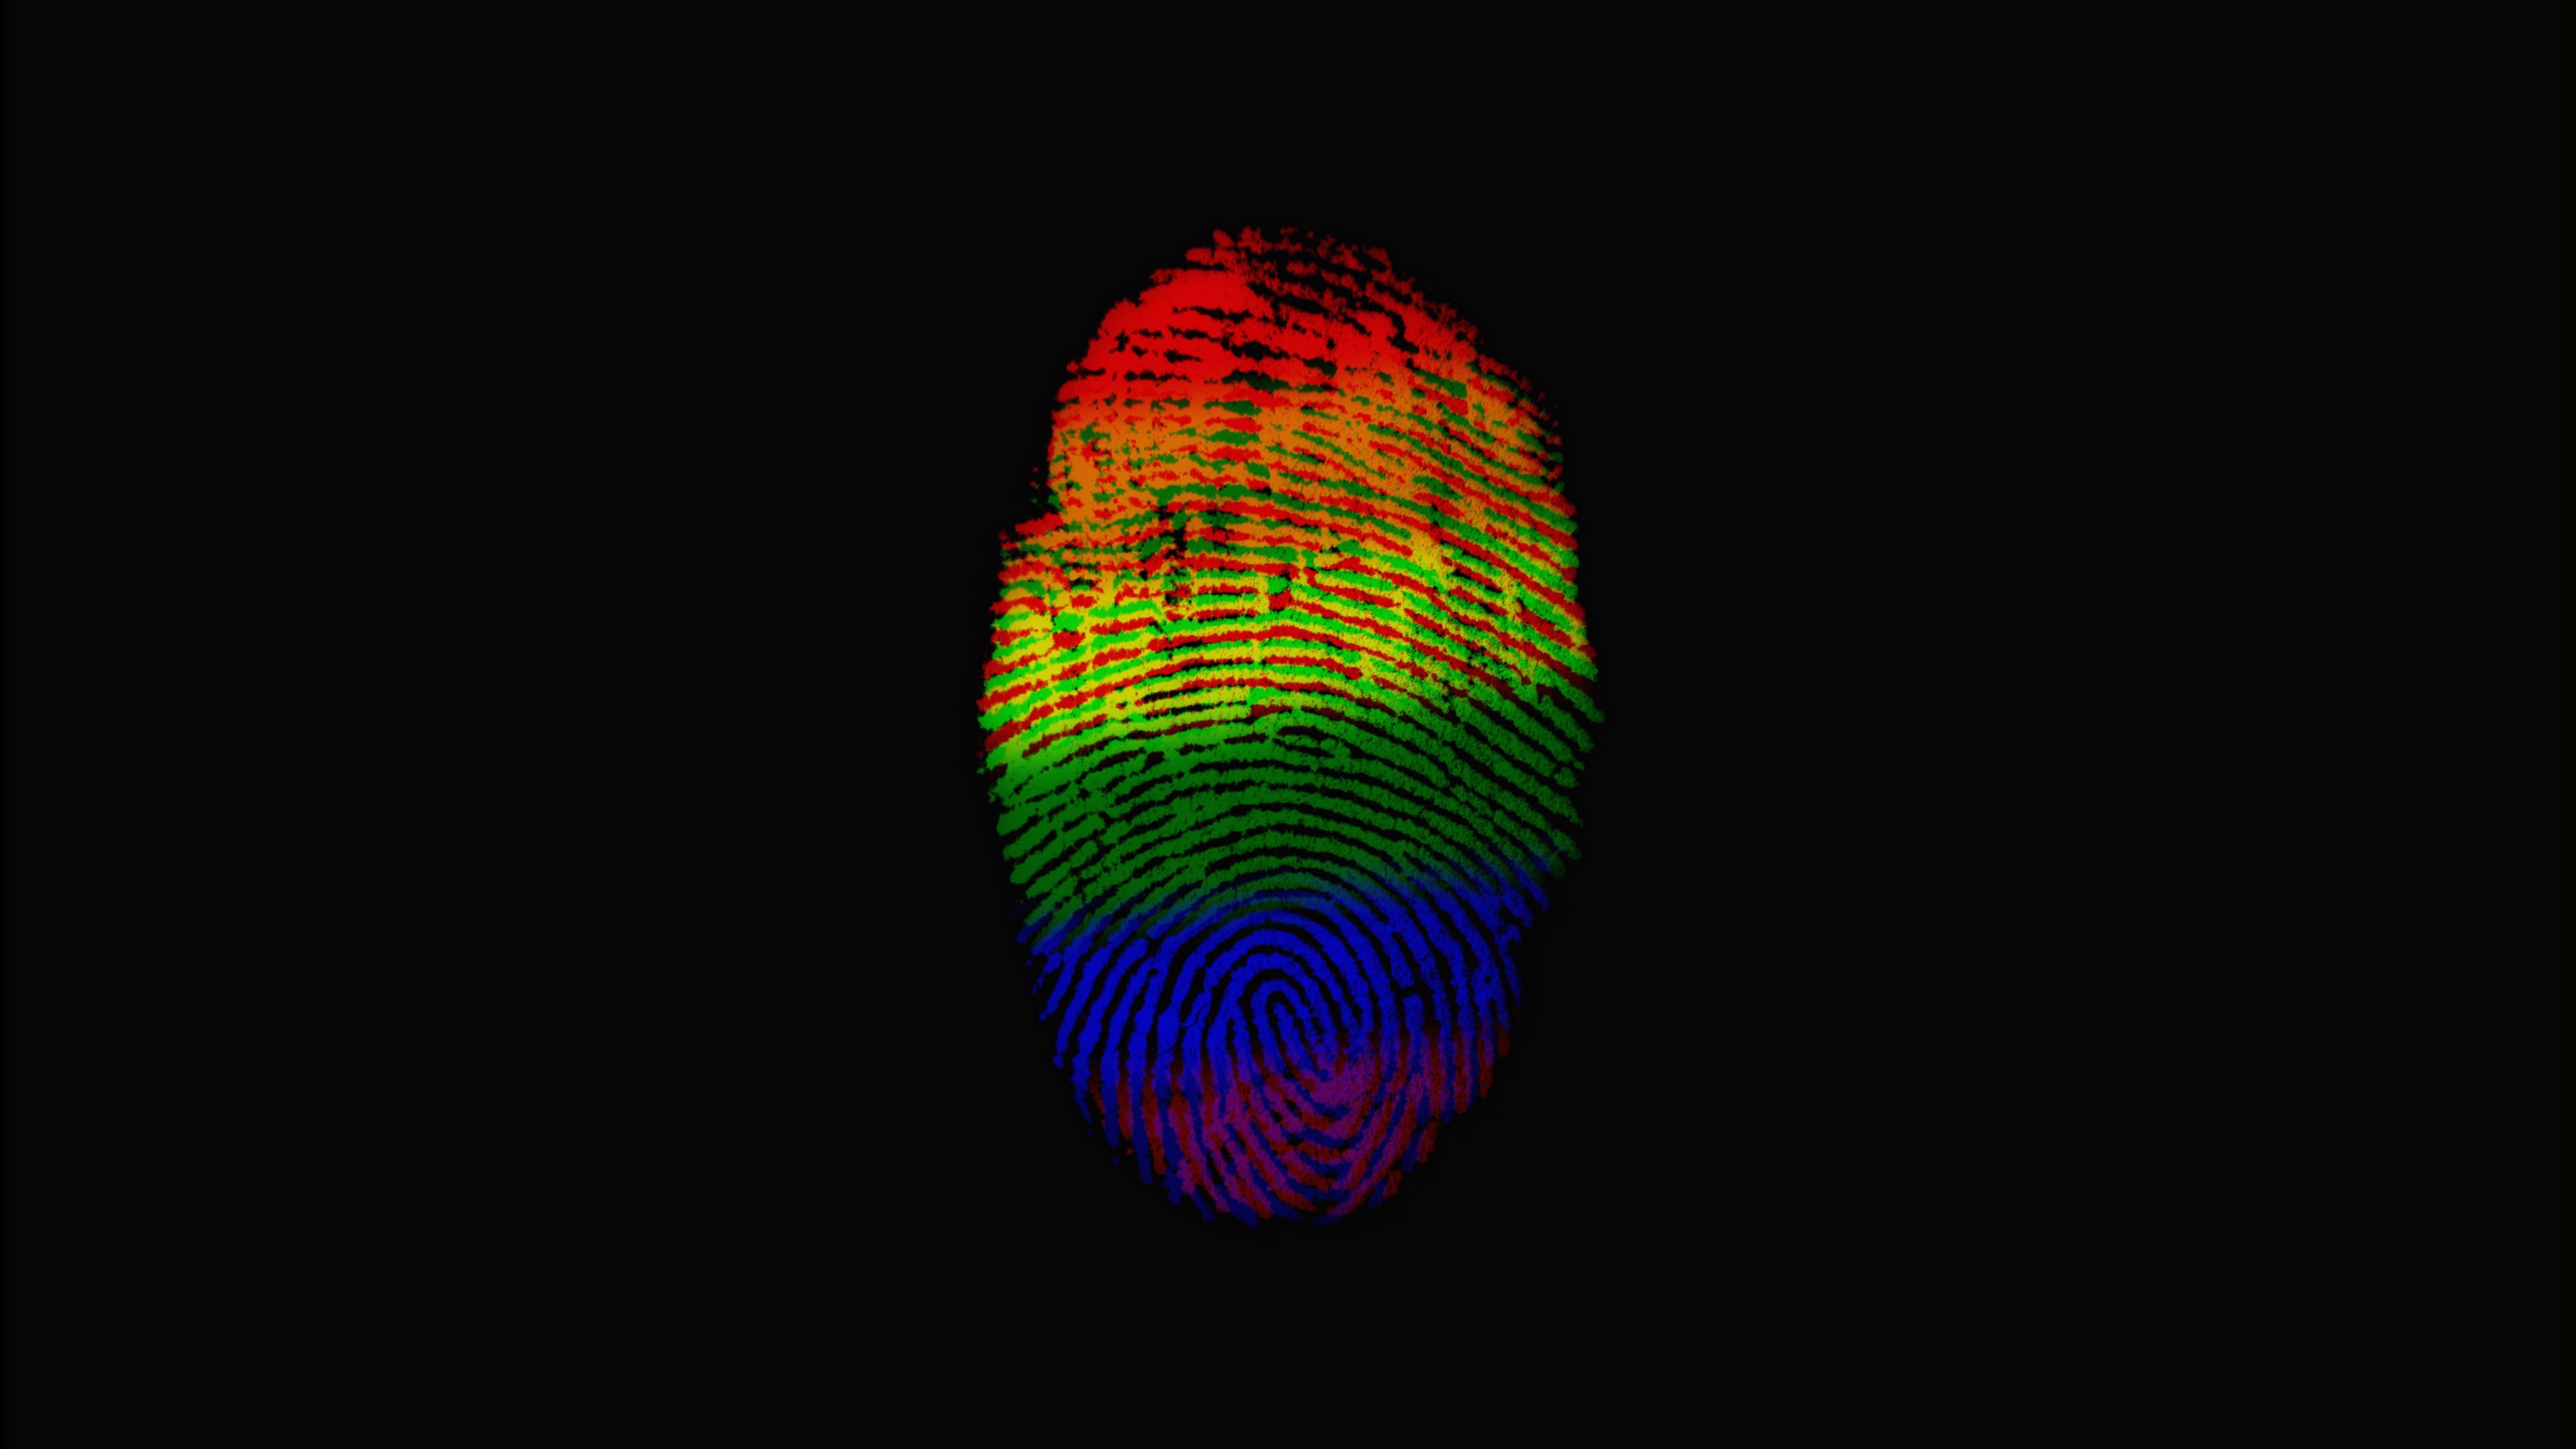 imprint finger rainbow colorful 4k 1540575999 - imprint, finger, rainbow, colorful 4k - rainbow, imprint, finger